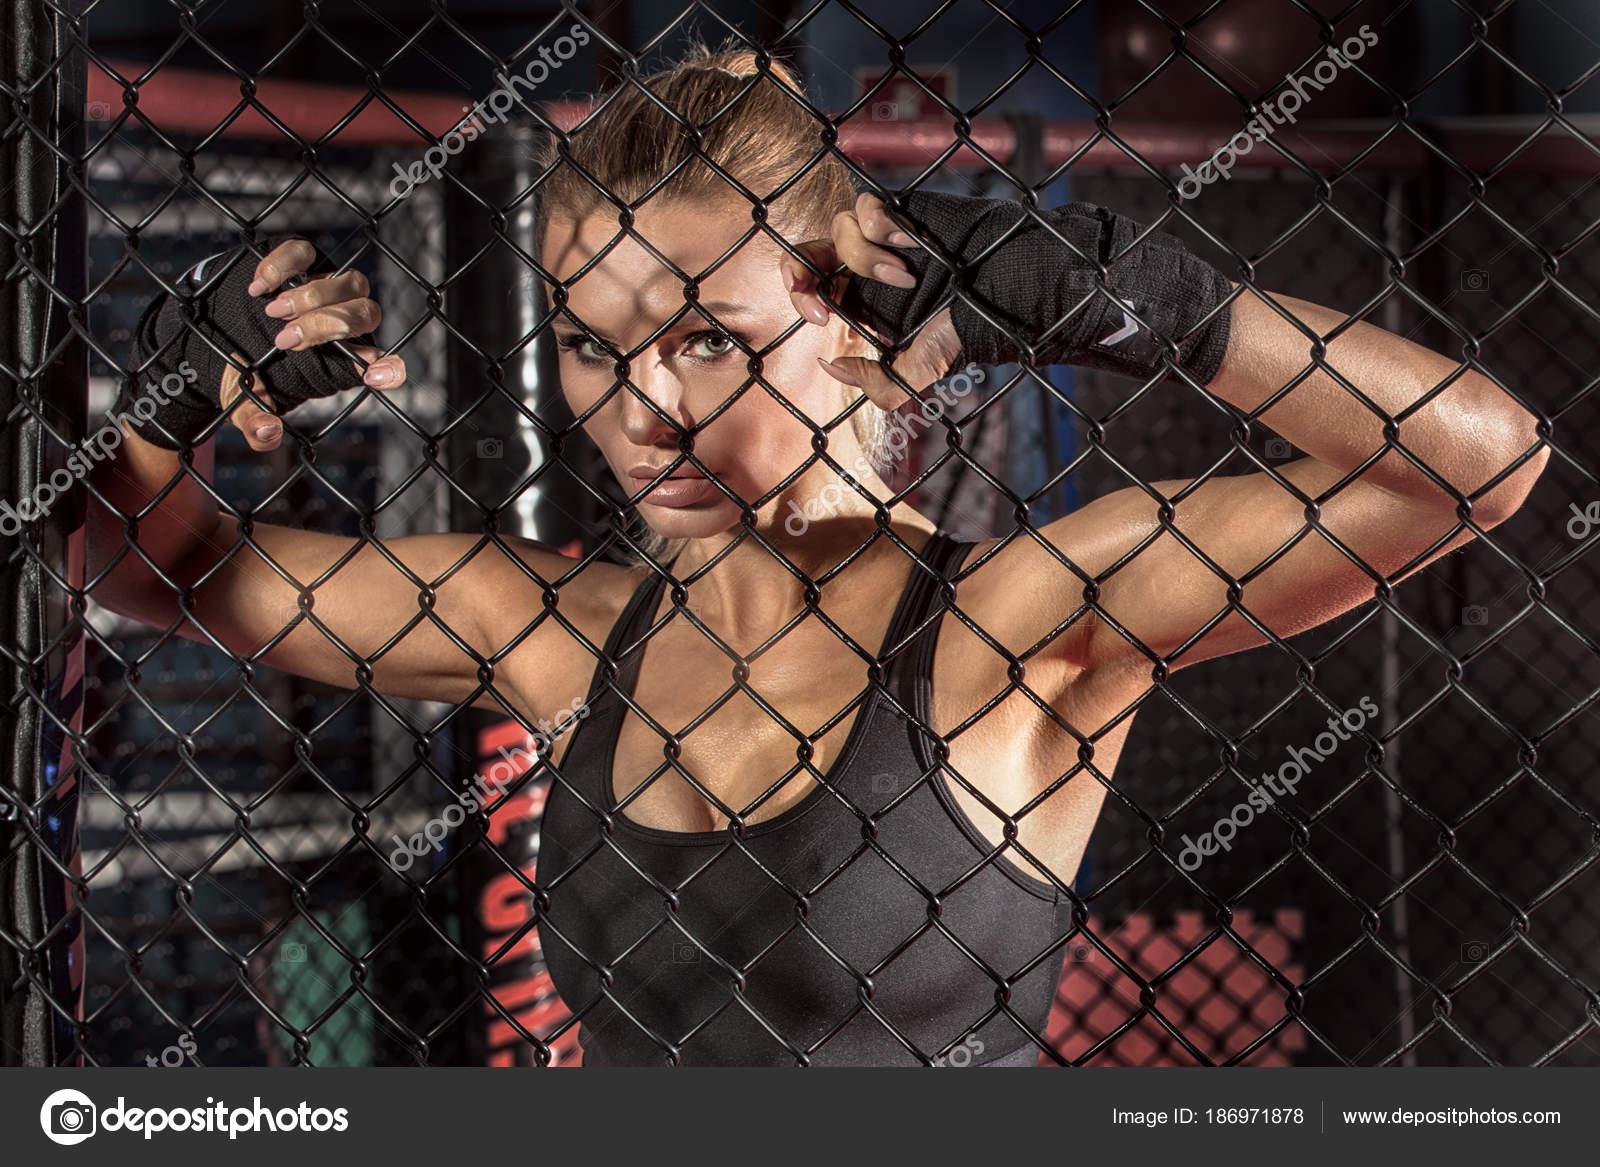 Boxeadora posando dentro de una jaula del boxeo — Fotos de Stock ...